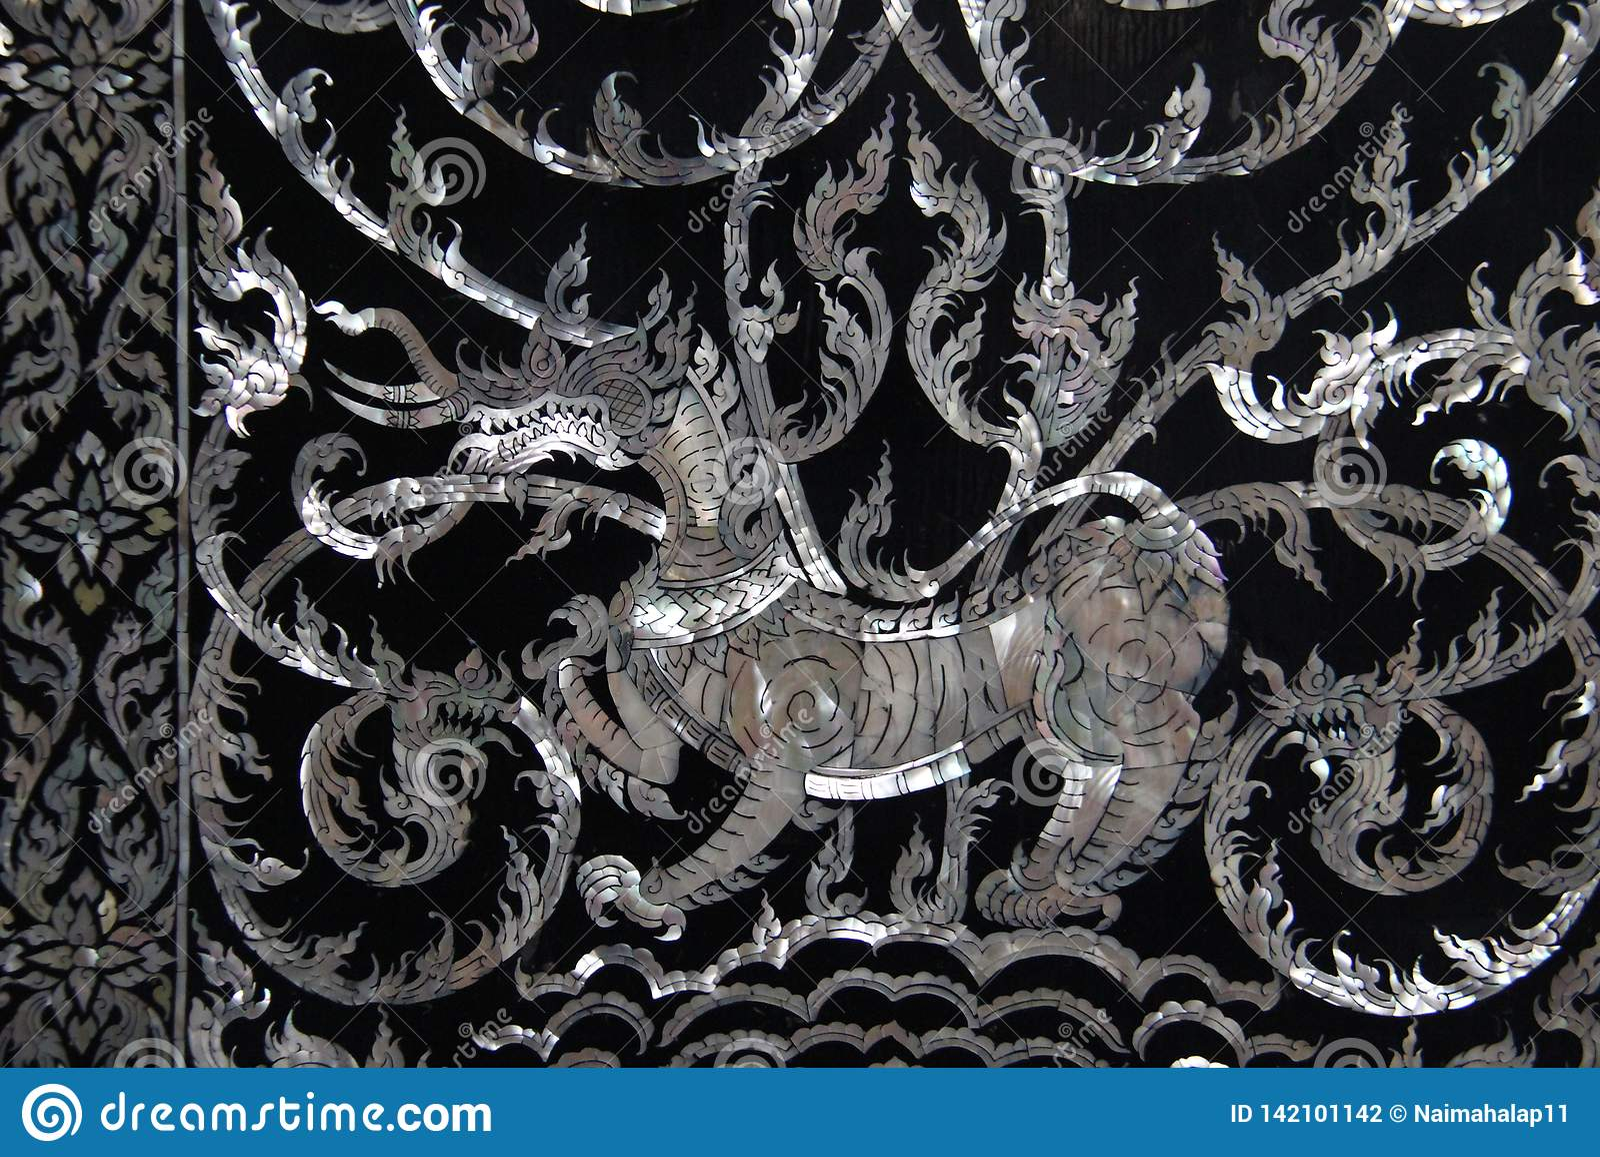 Art Lion And Local Pattern Made fino da pérola Shell